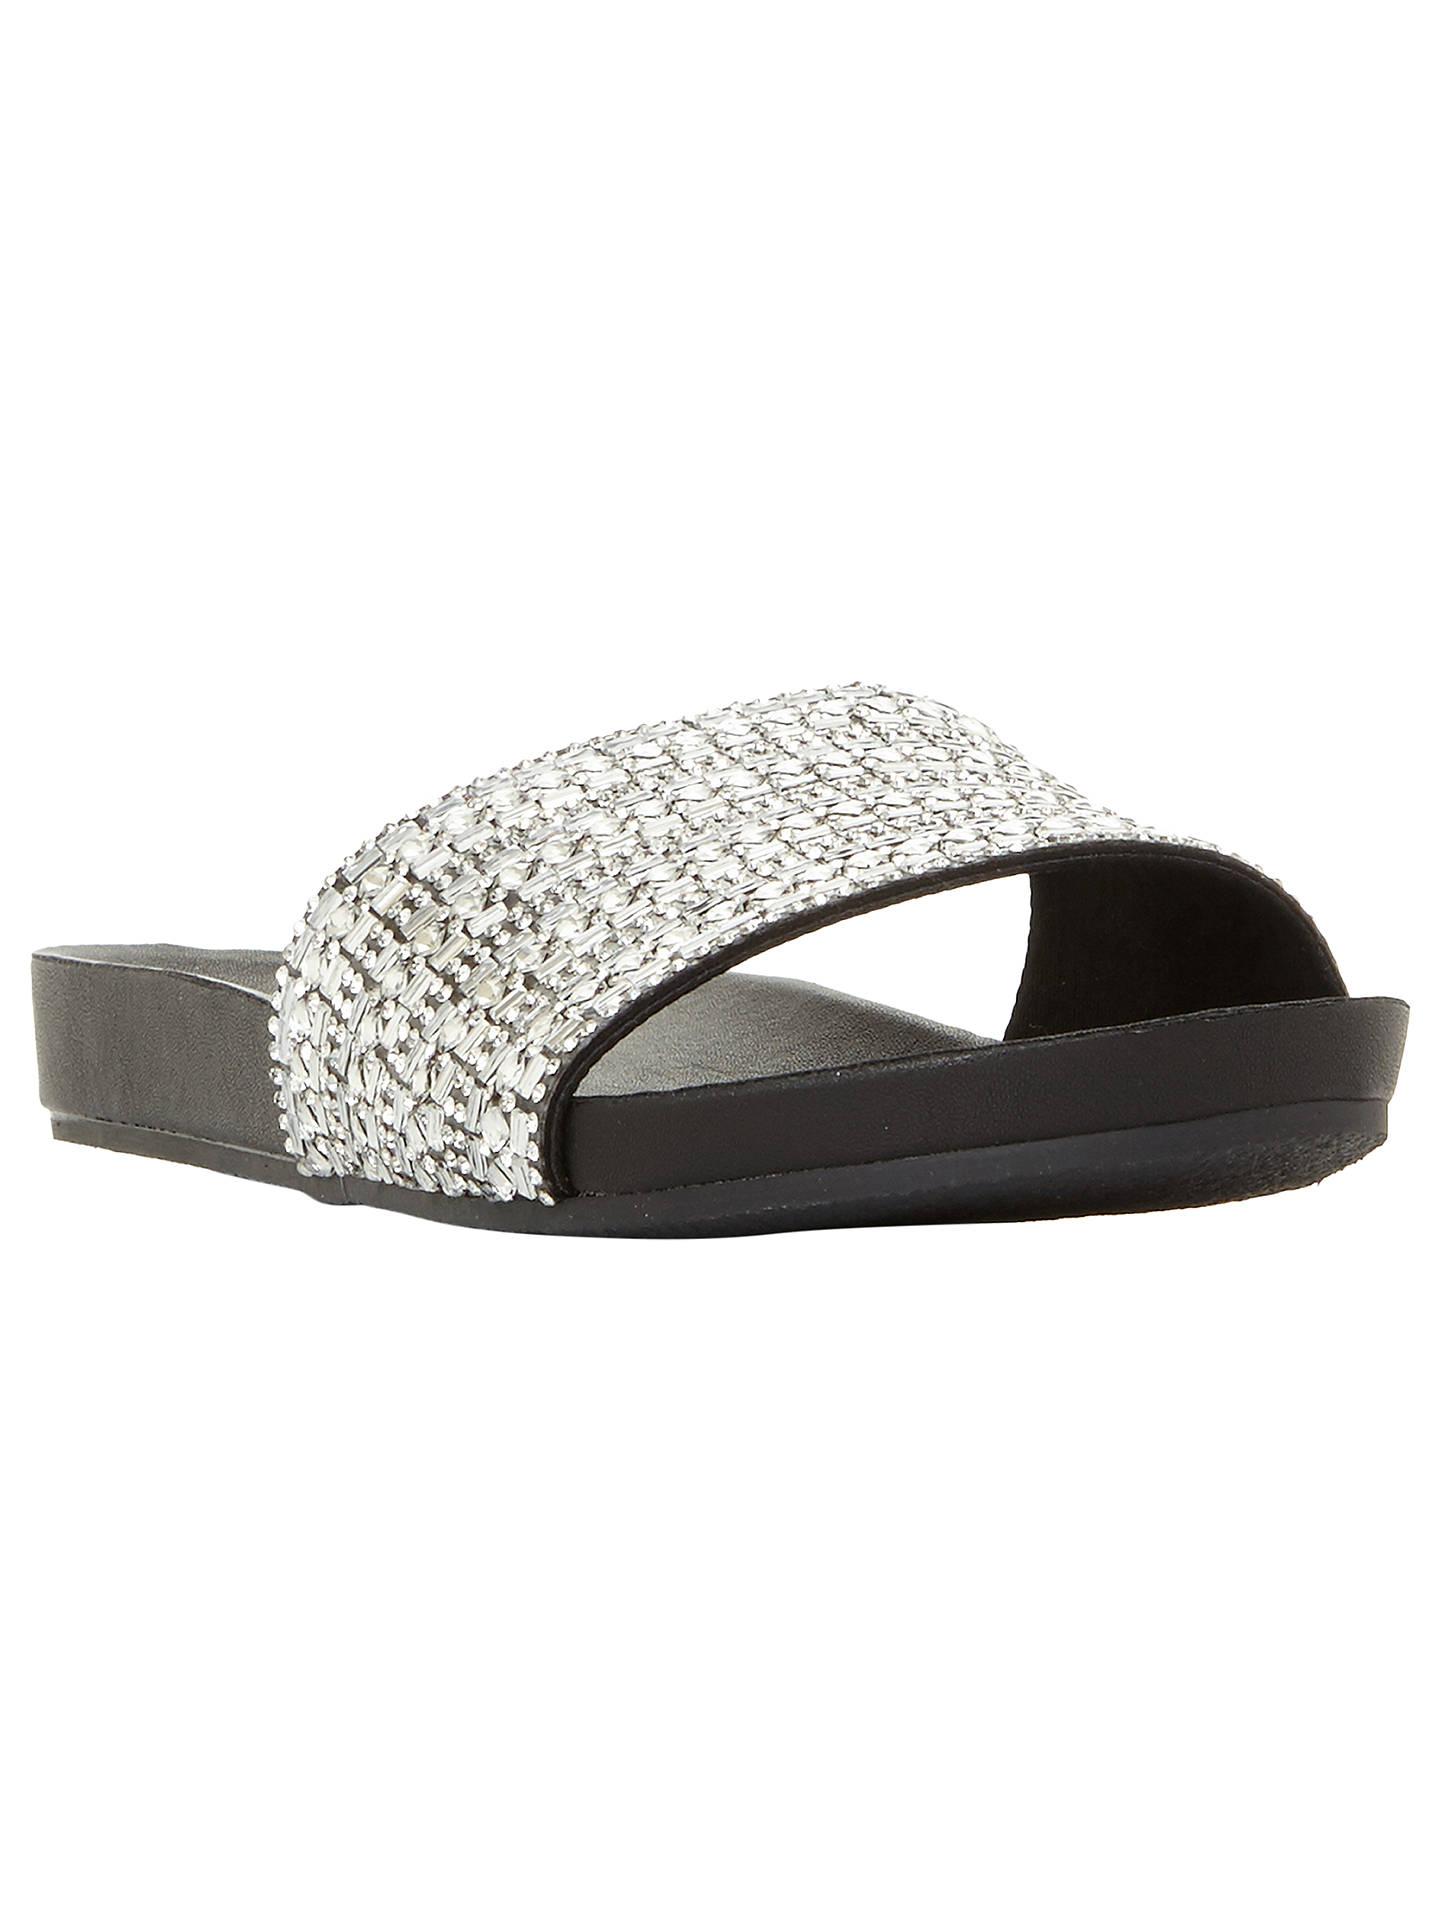 8a43d63fd668 Steve Madden Dazzle Slider Sandals at John Lewis   Partners